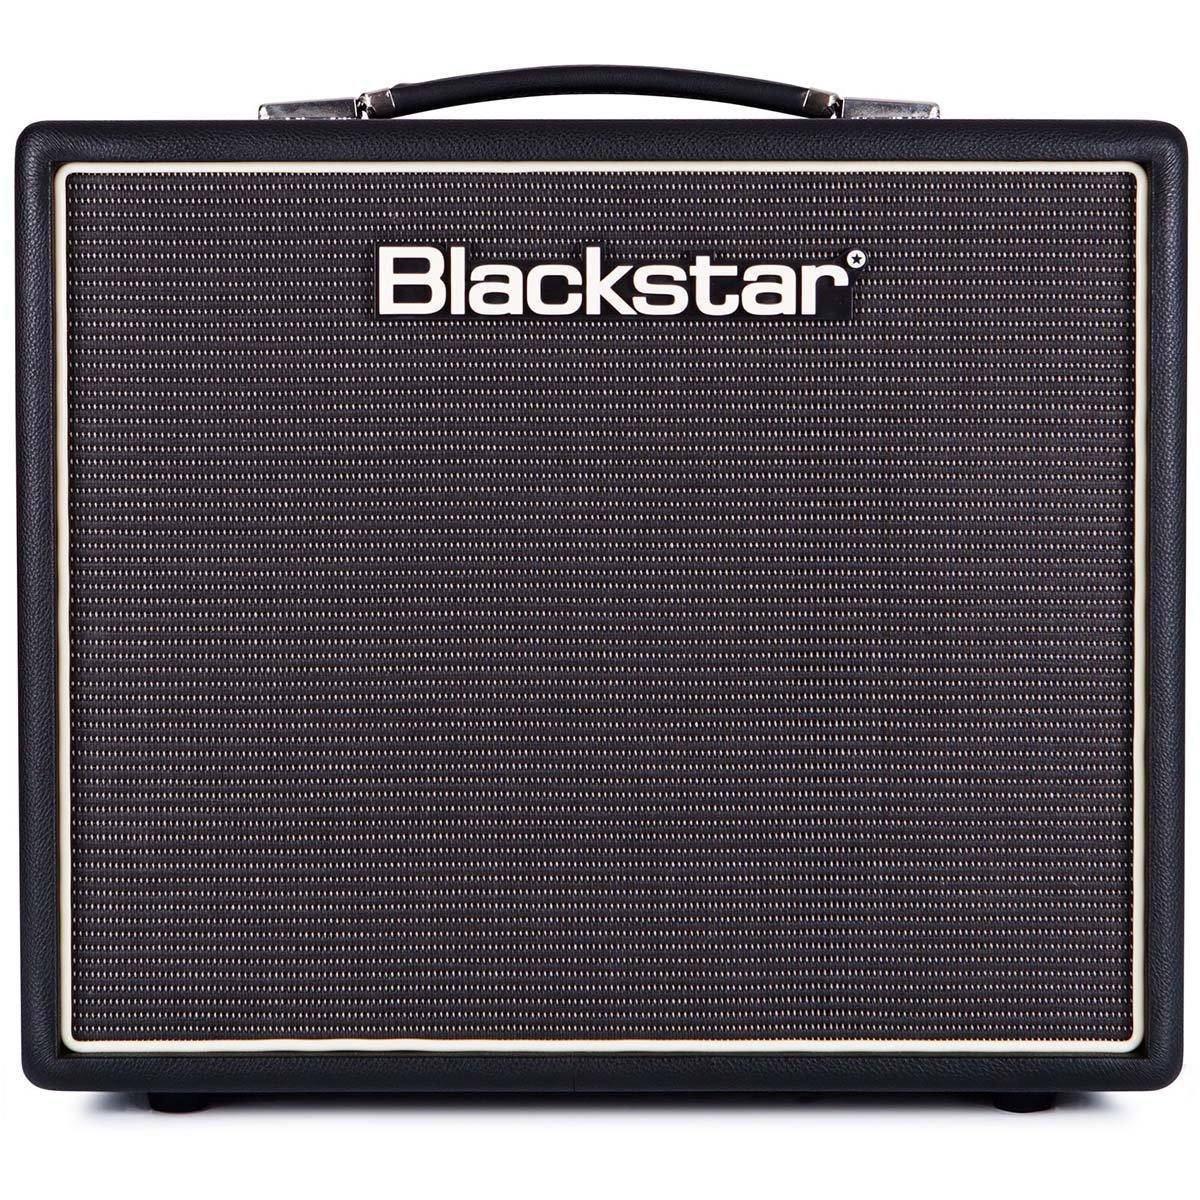 Best valves for Blackstar Studio 10 EL34 amplifier